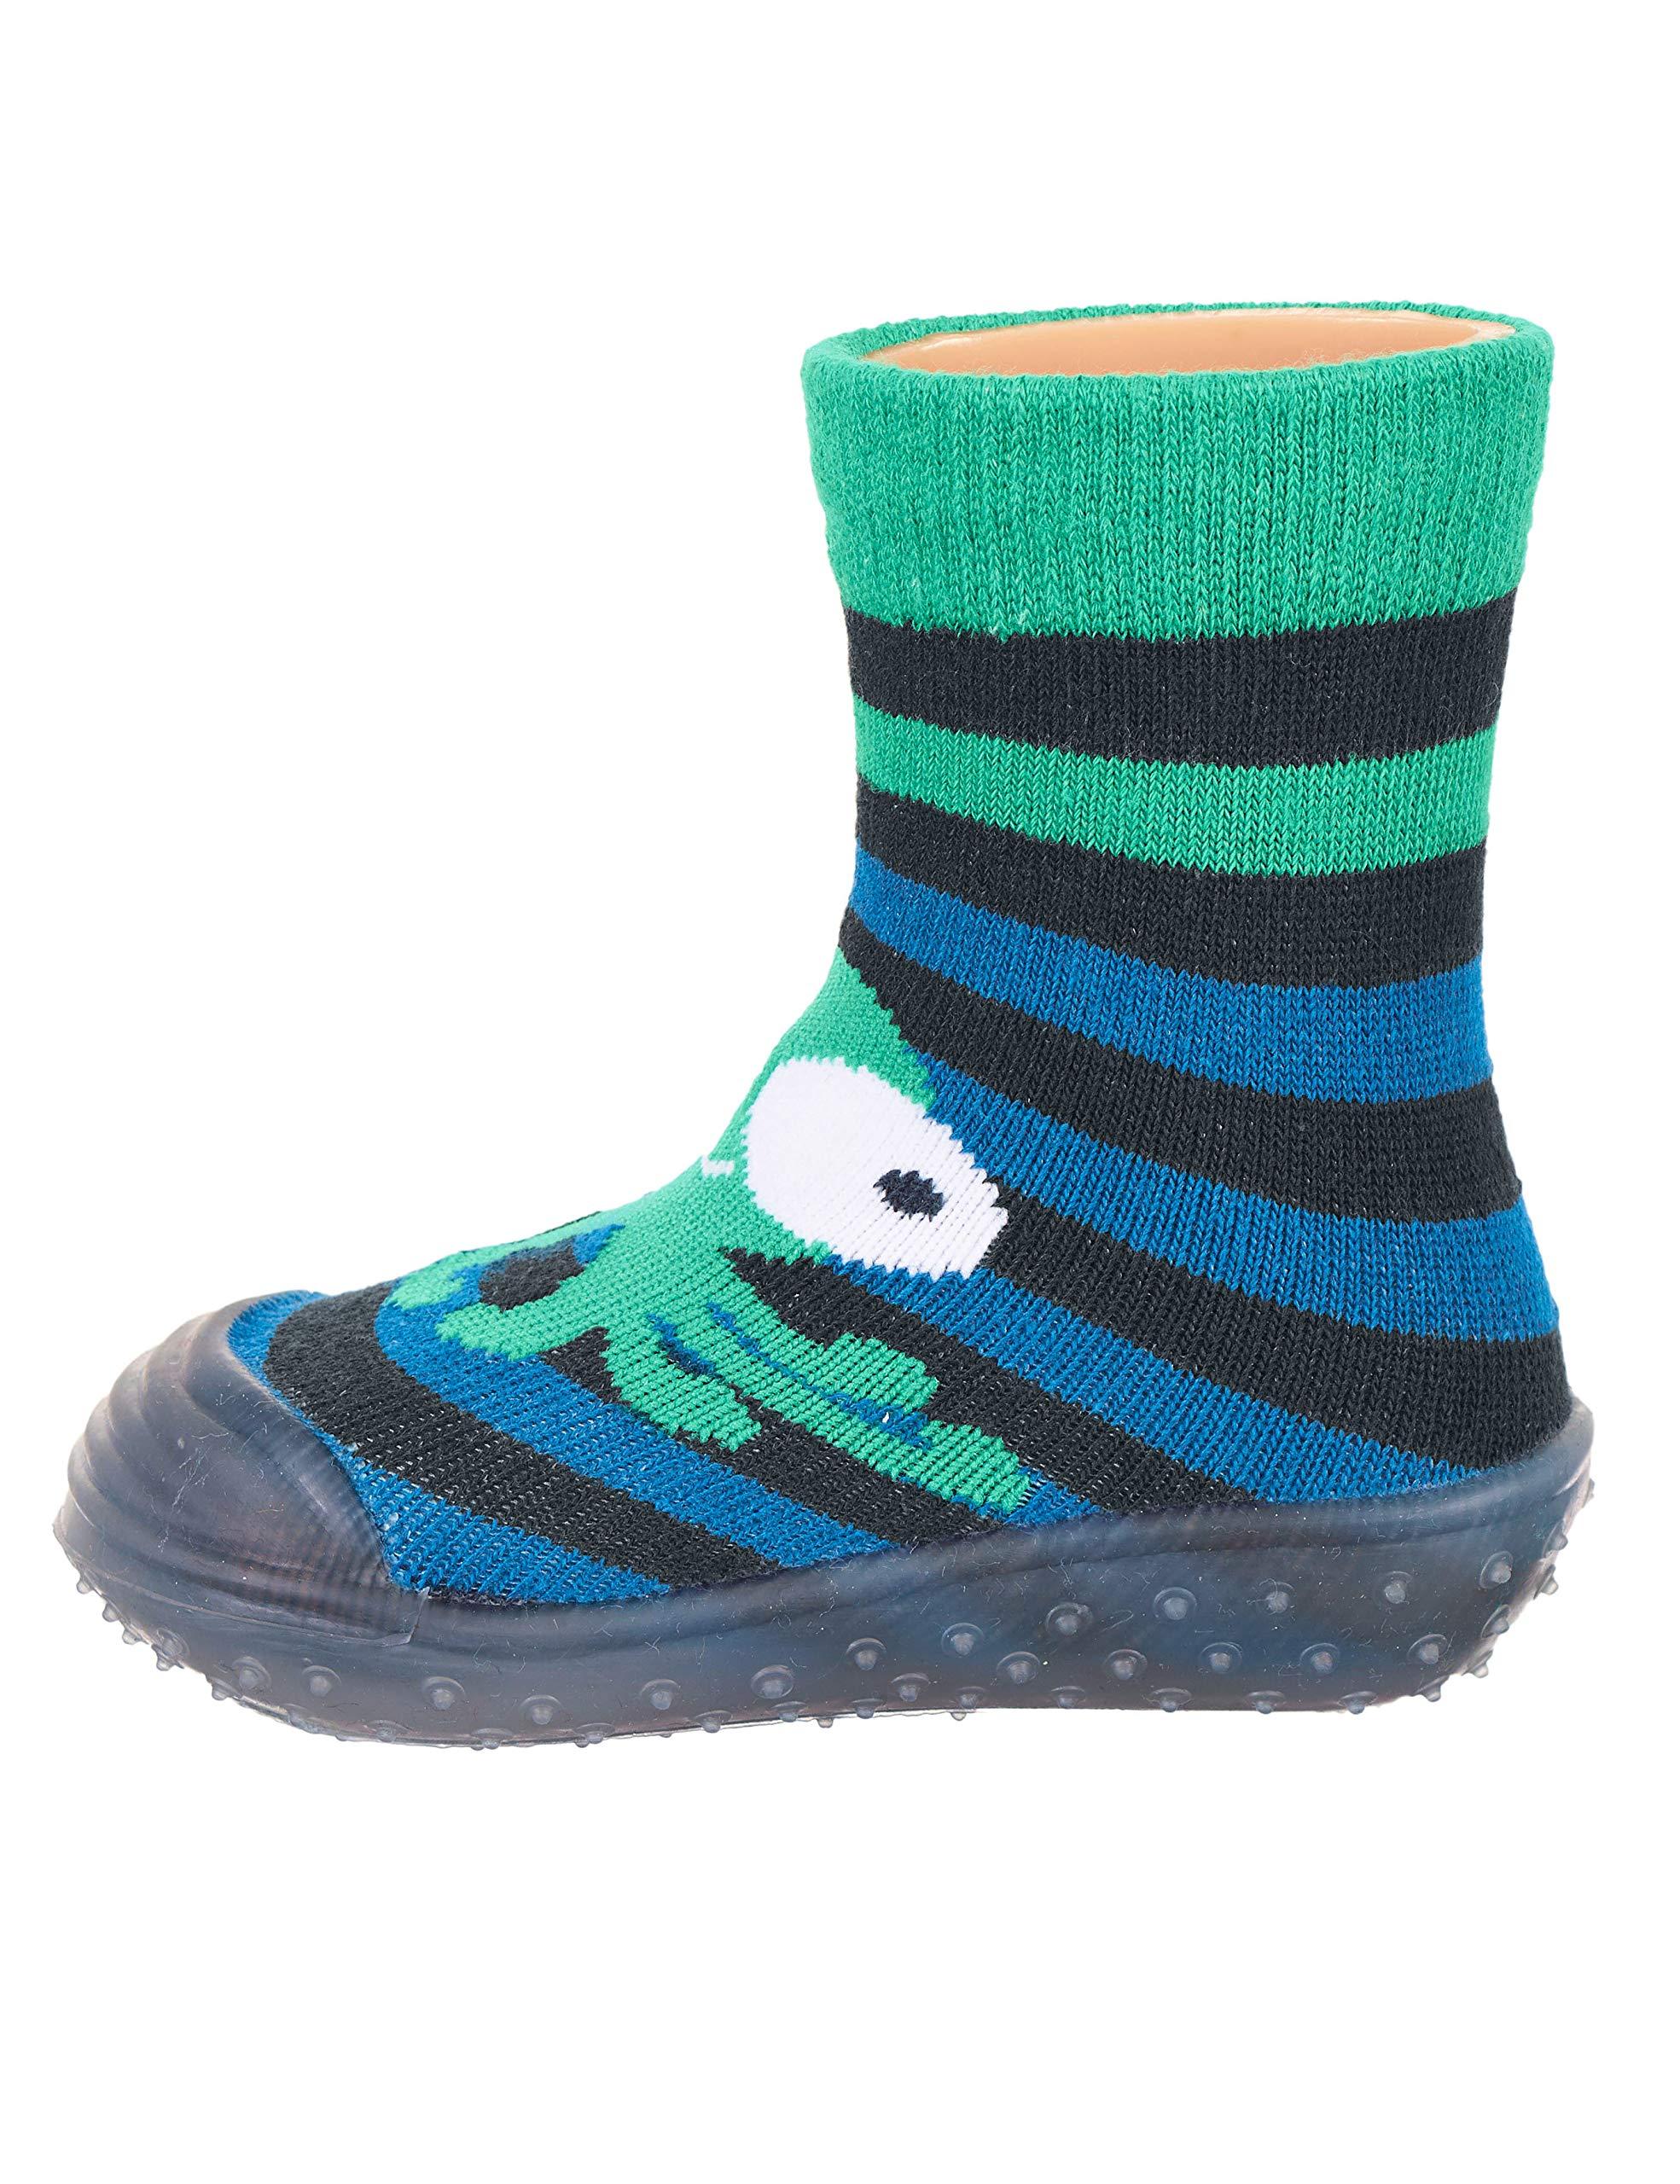 Sterntaler Adventure-Socks Qualle, Zapatillas Impermeables para Niños 2